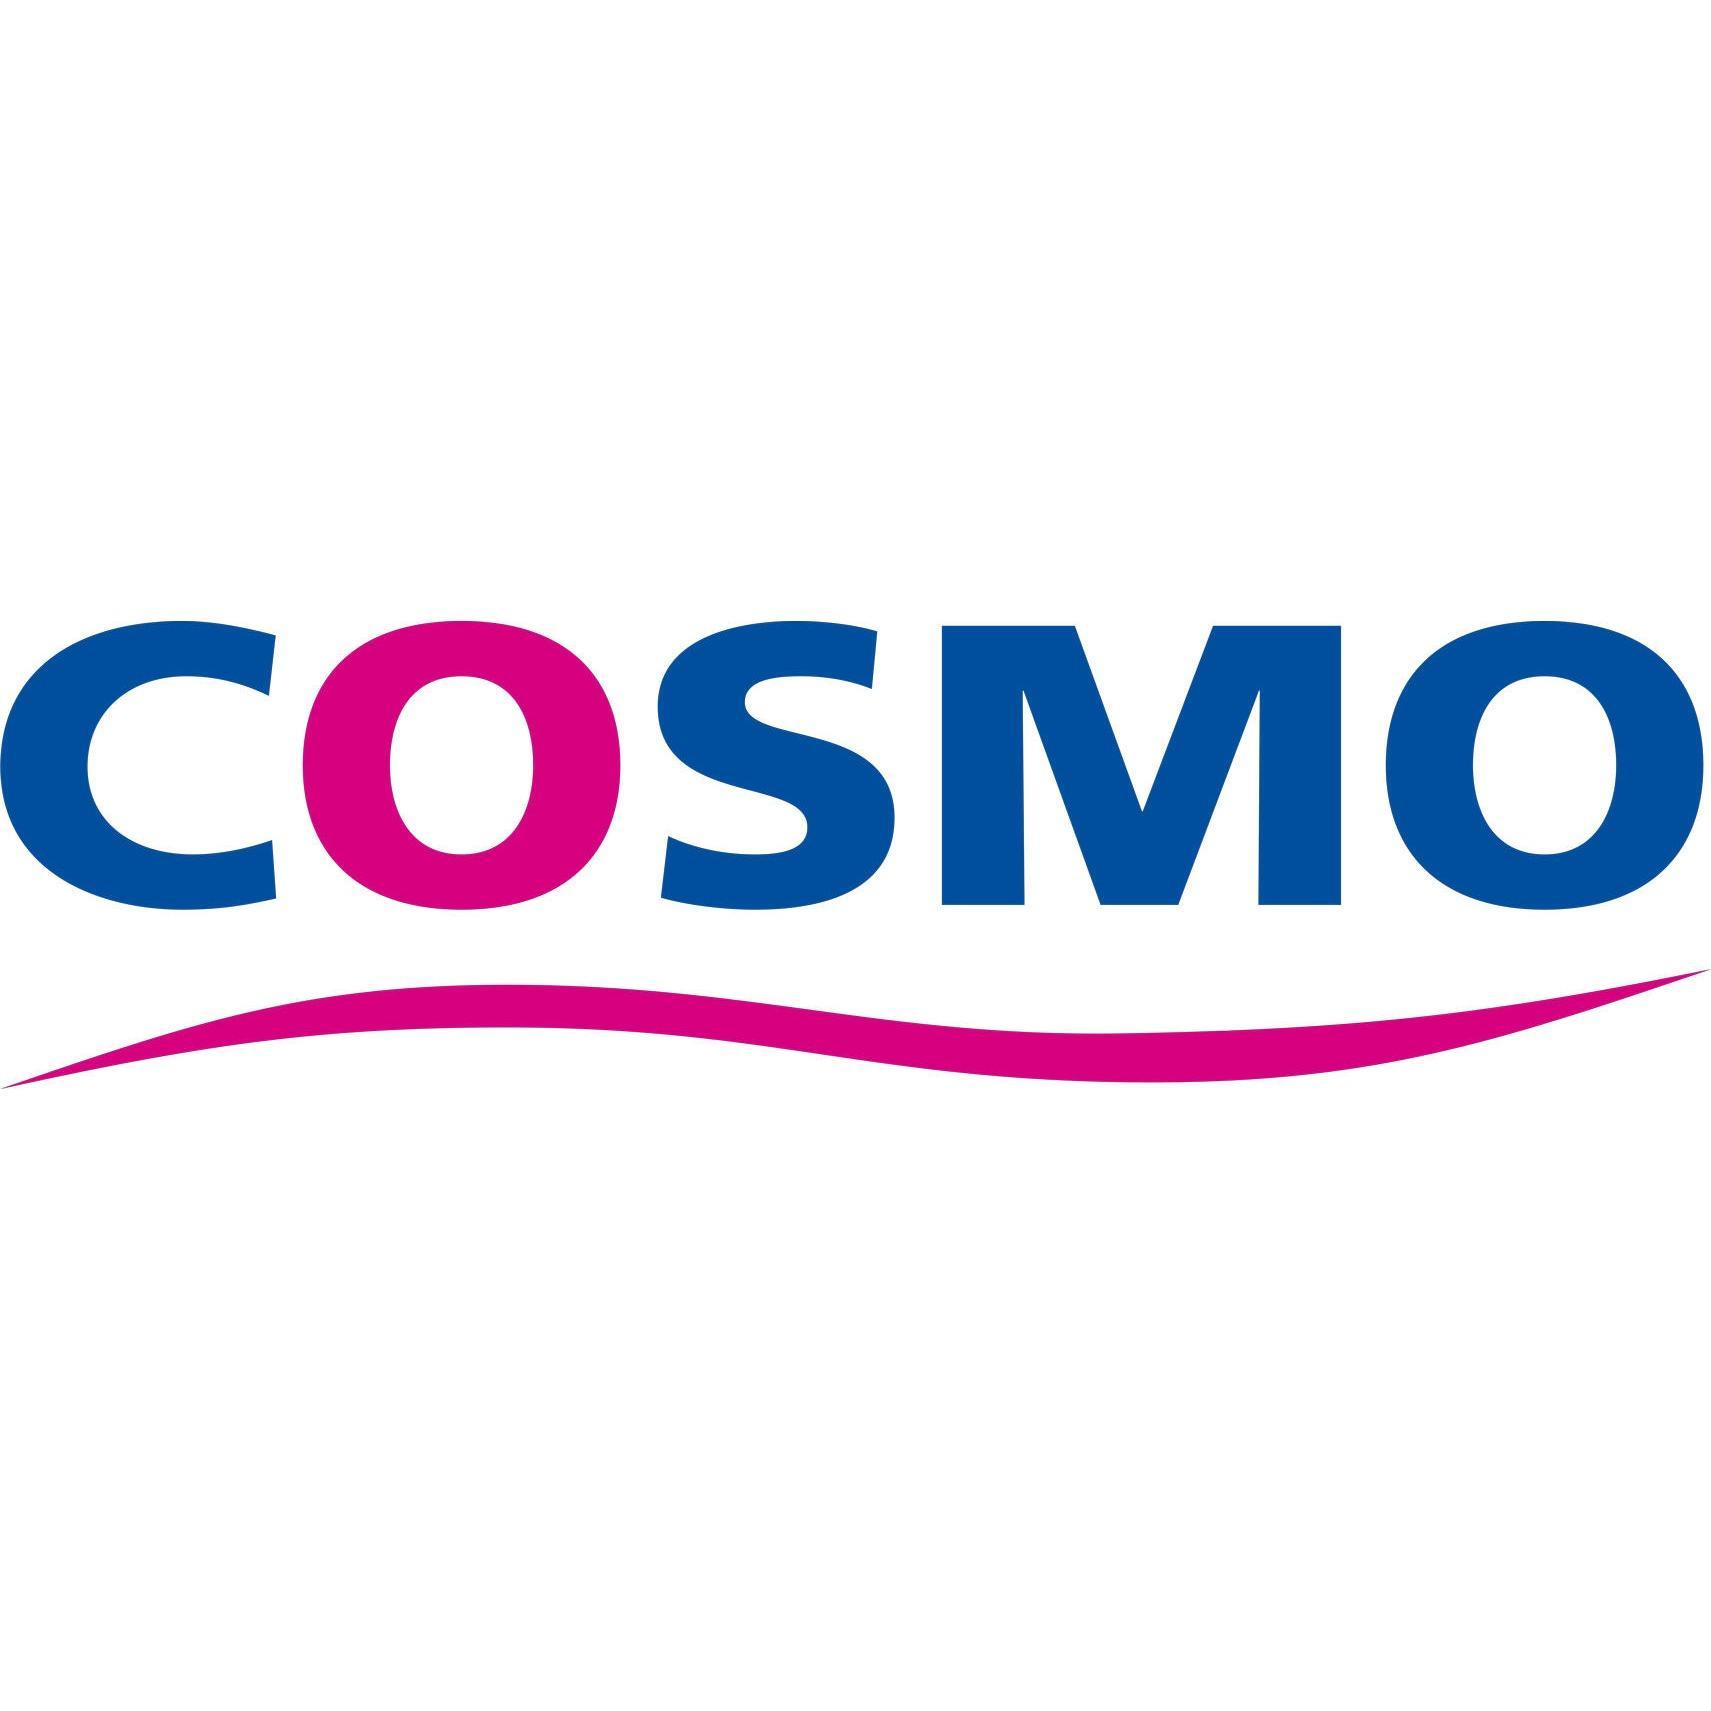 COSMO Shop Alexa am Alexanderplatz